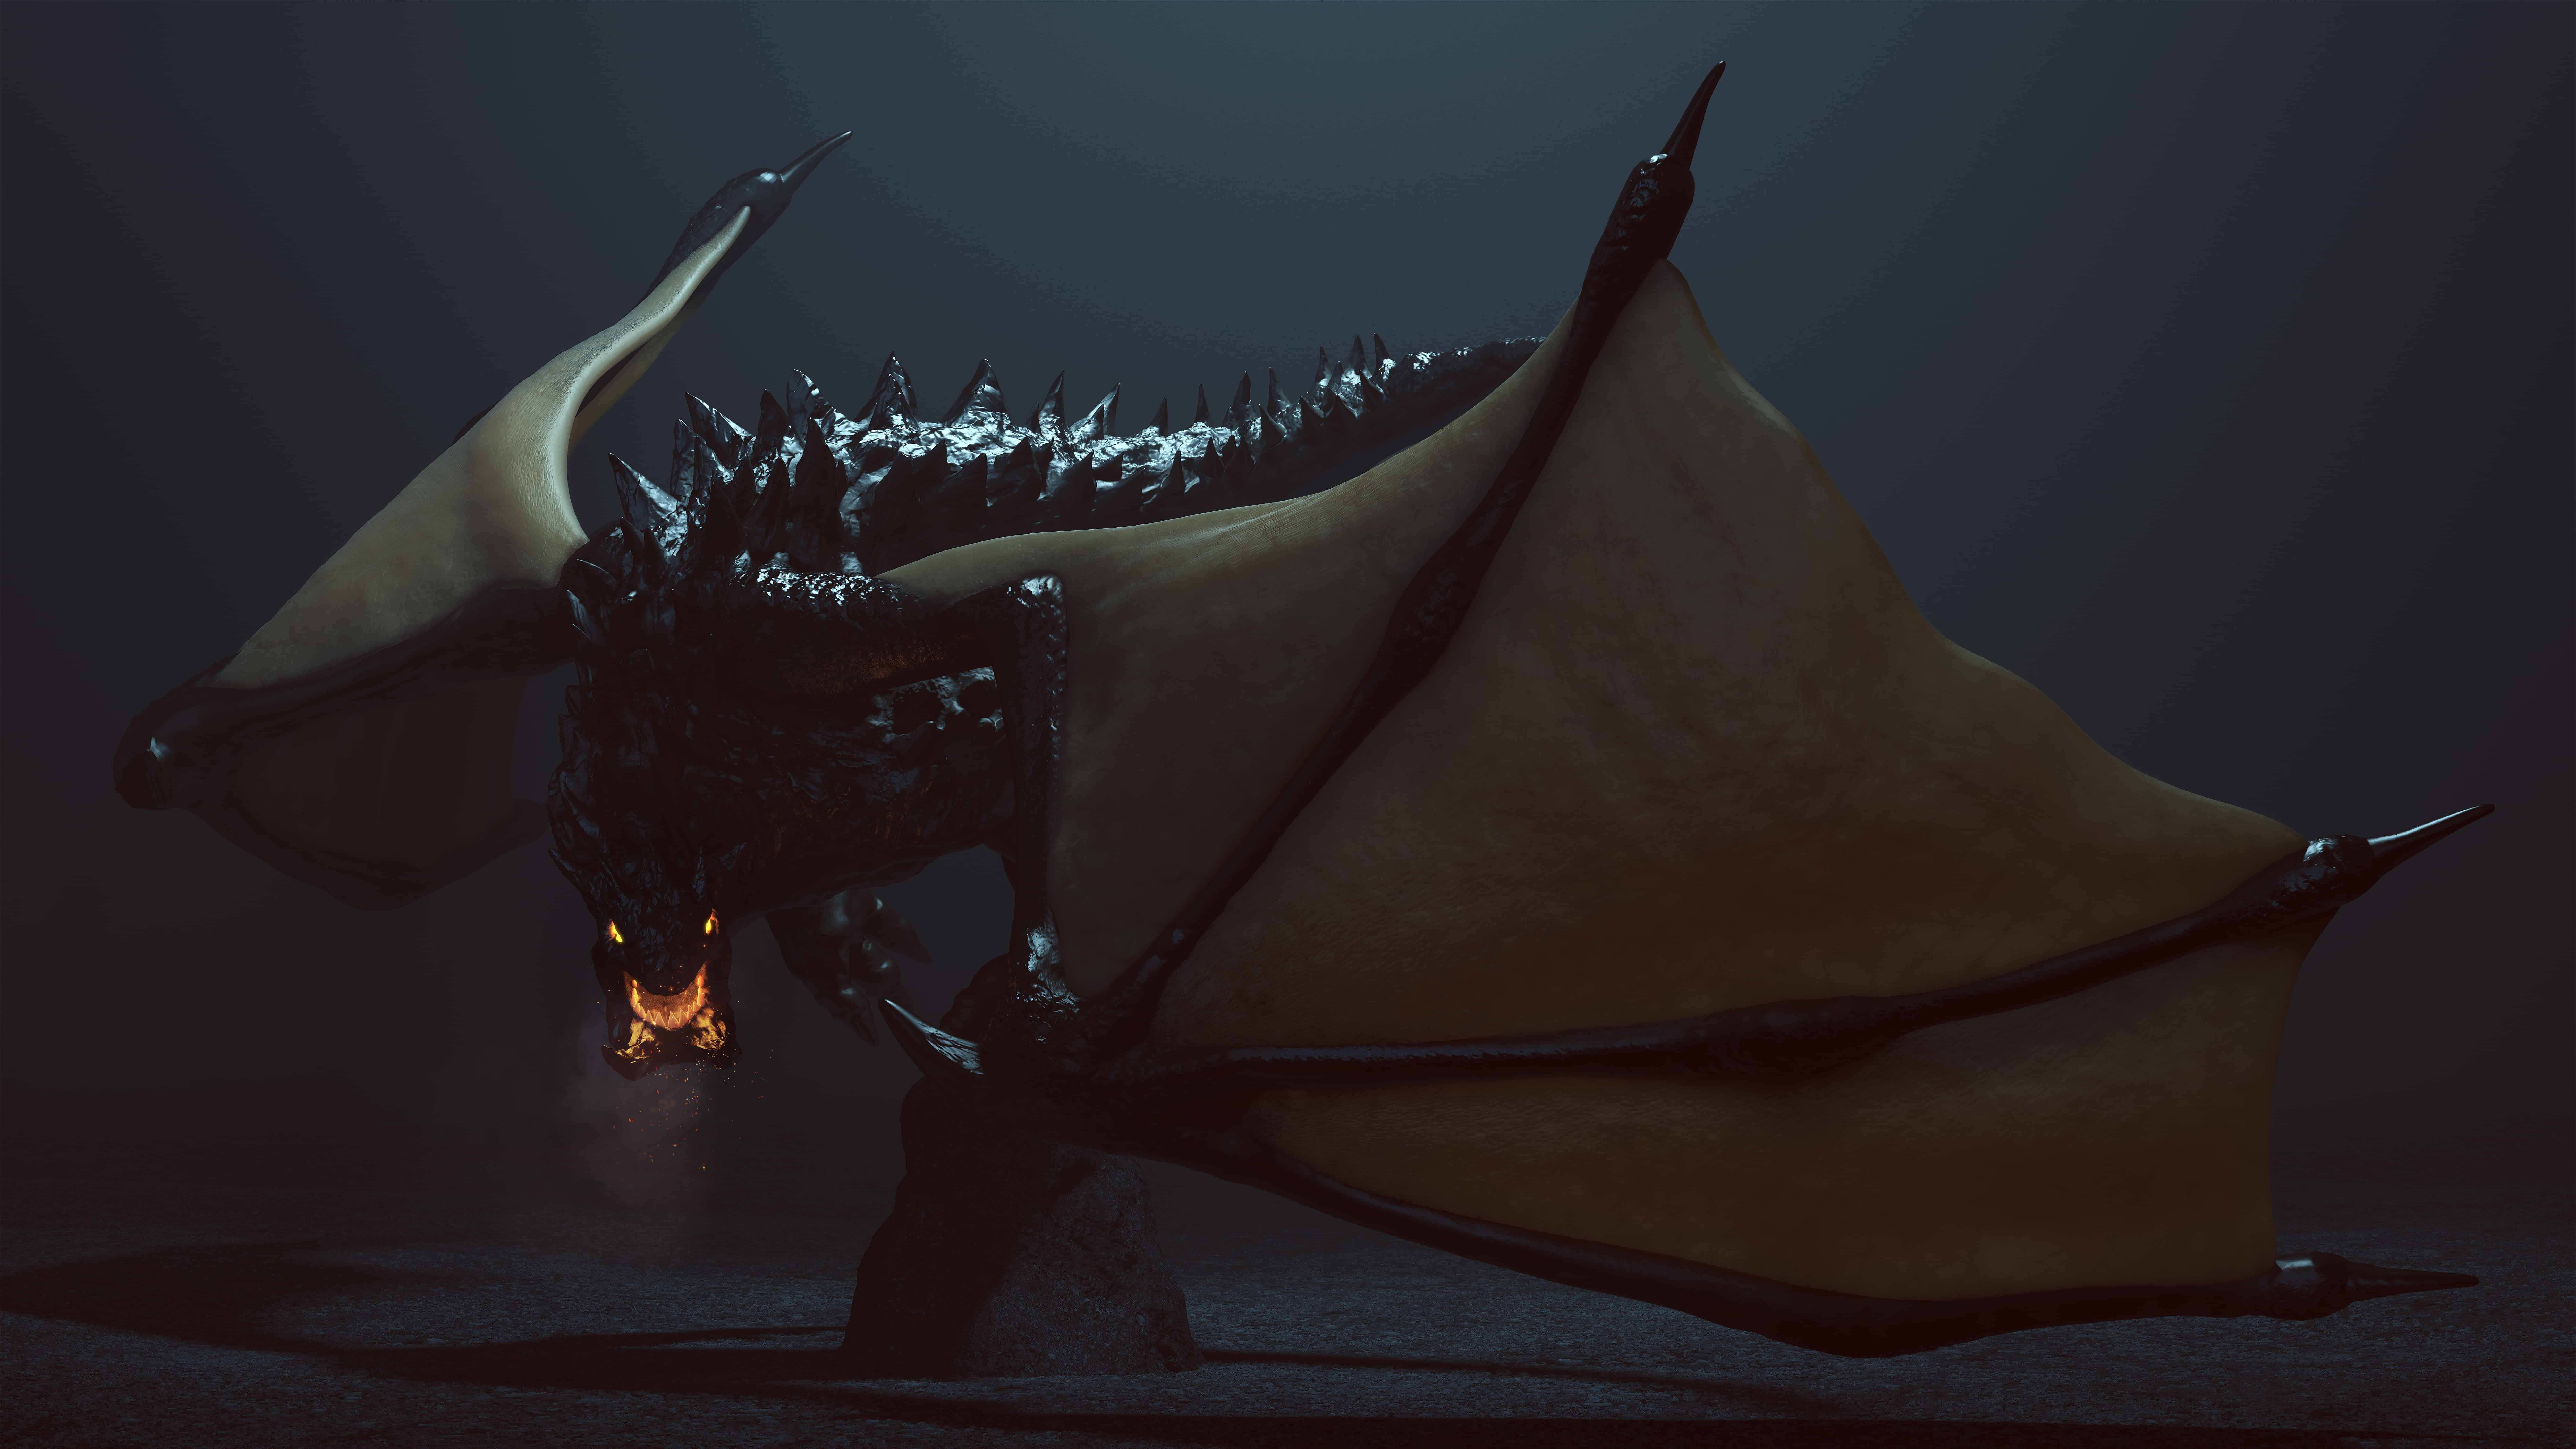 Black dragon dream meaning